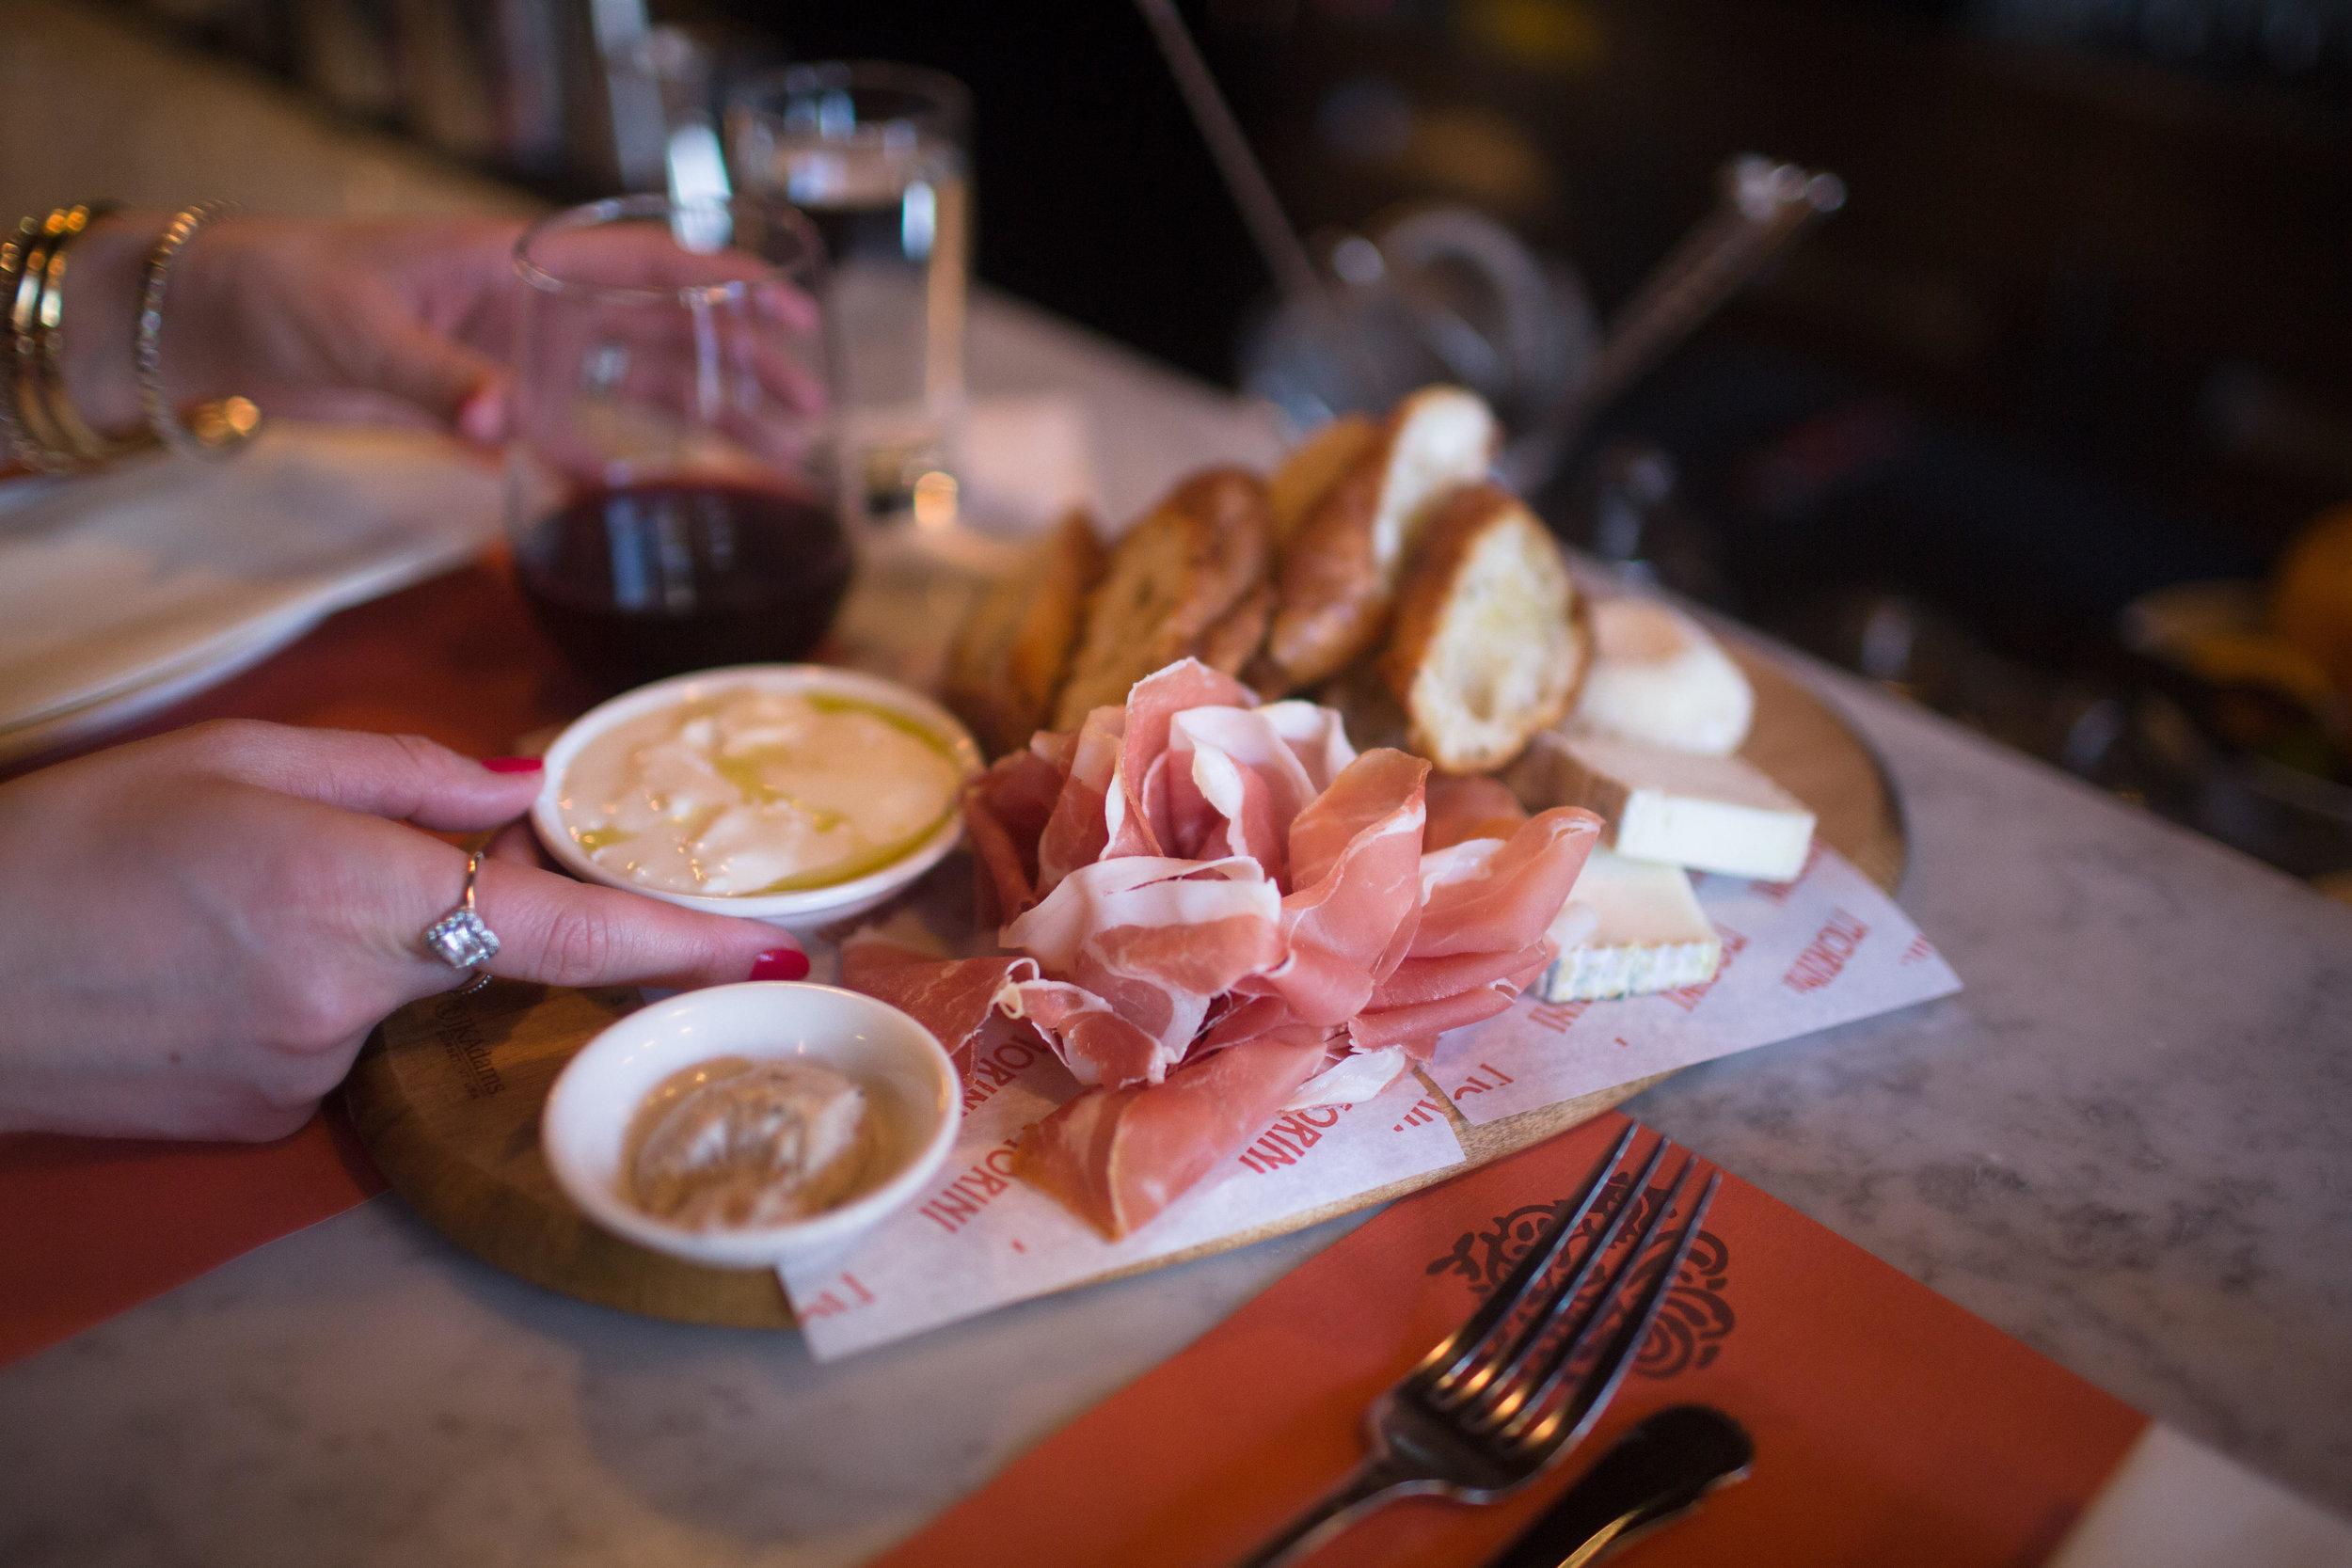 cheese plate at osteria morini